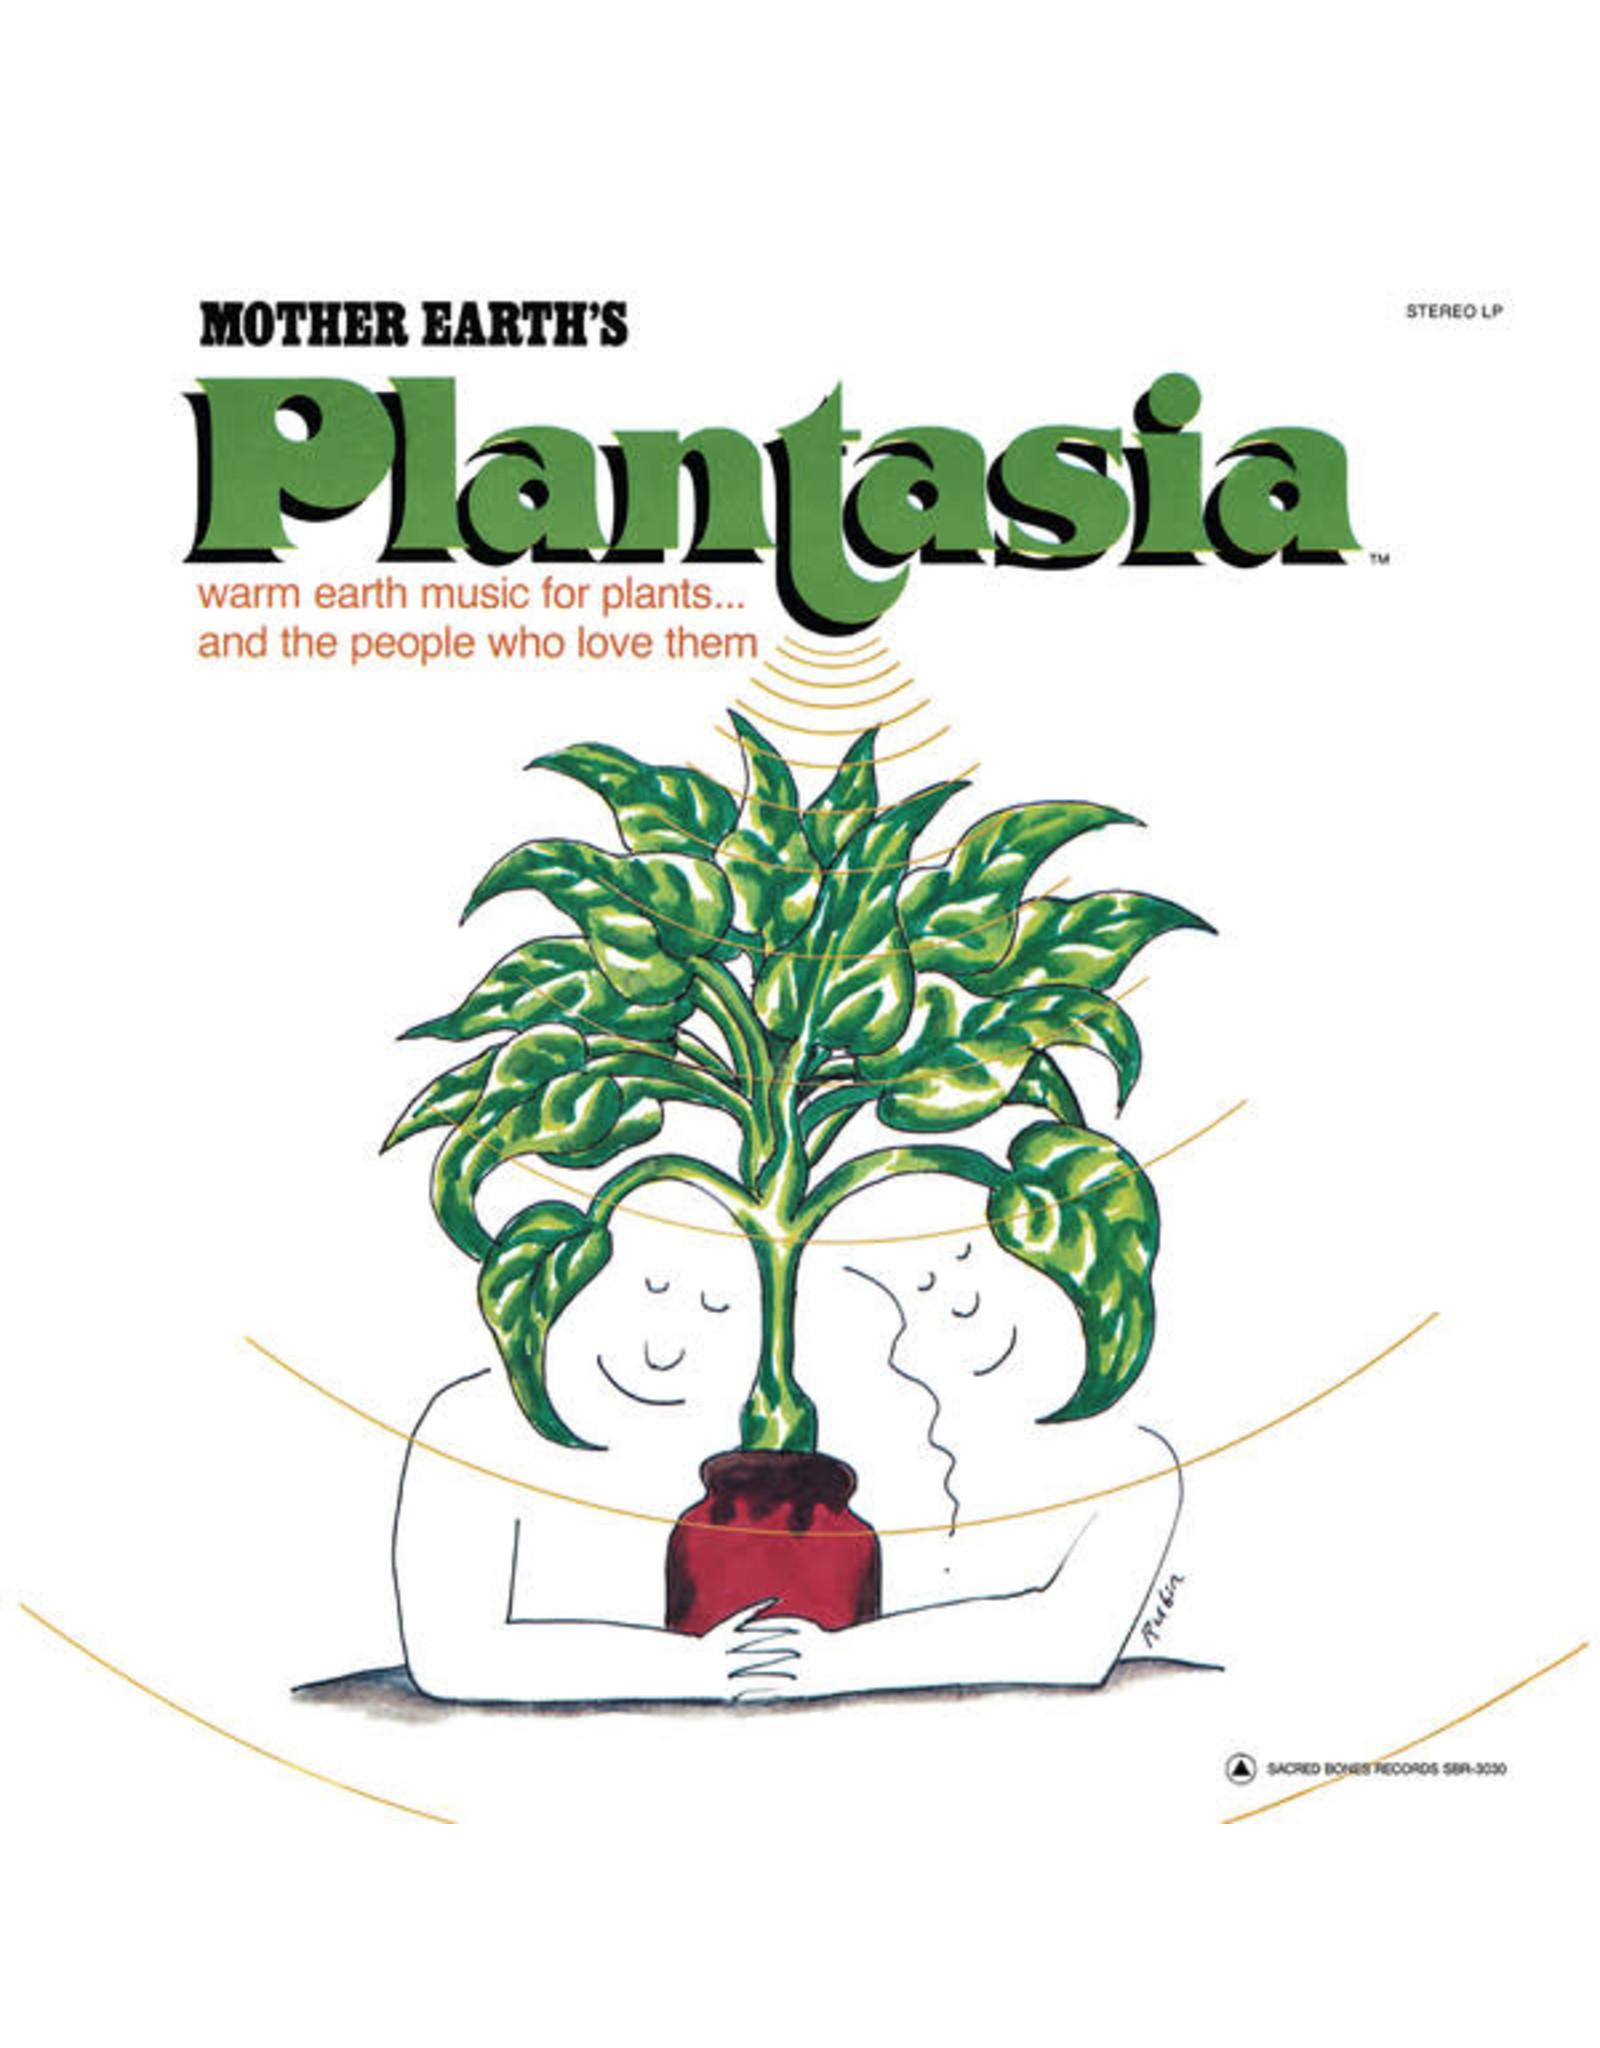 Garson, Mort - Mother Earth's Plantasia LP